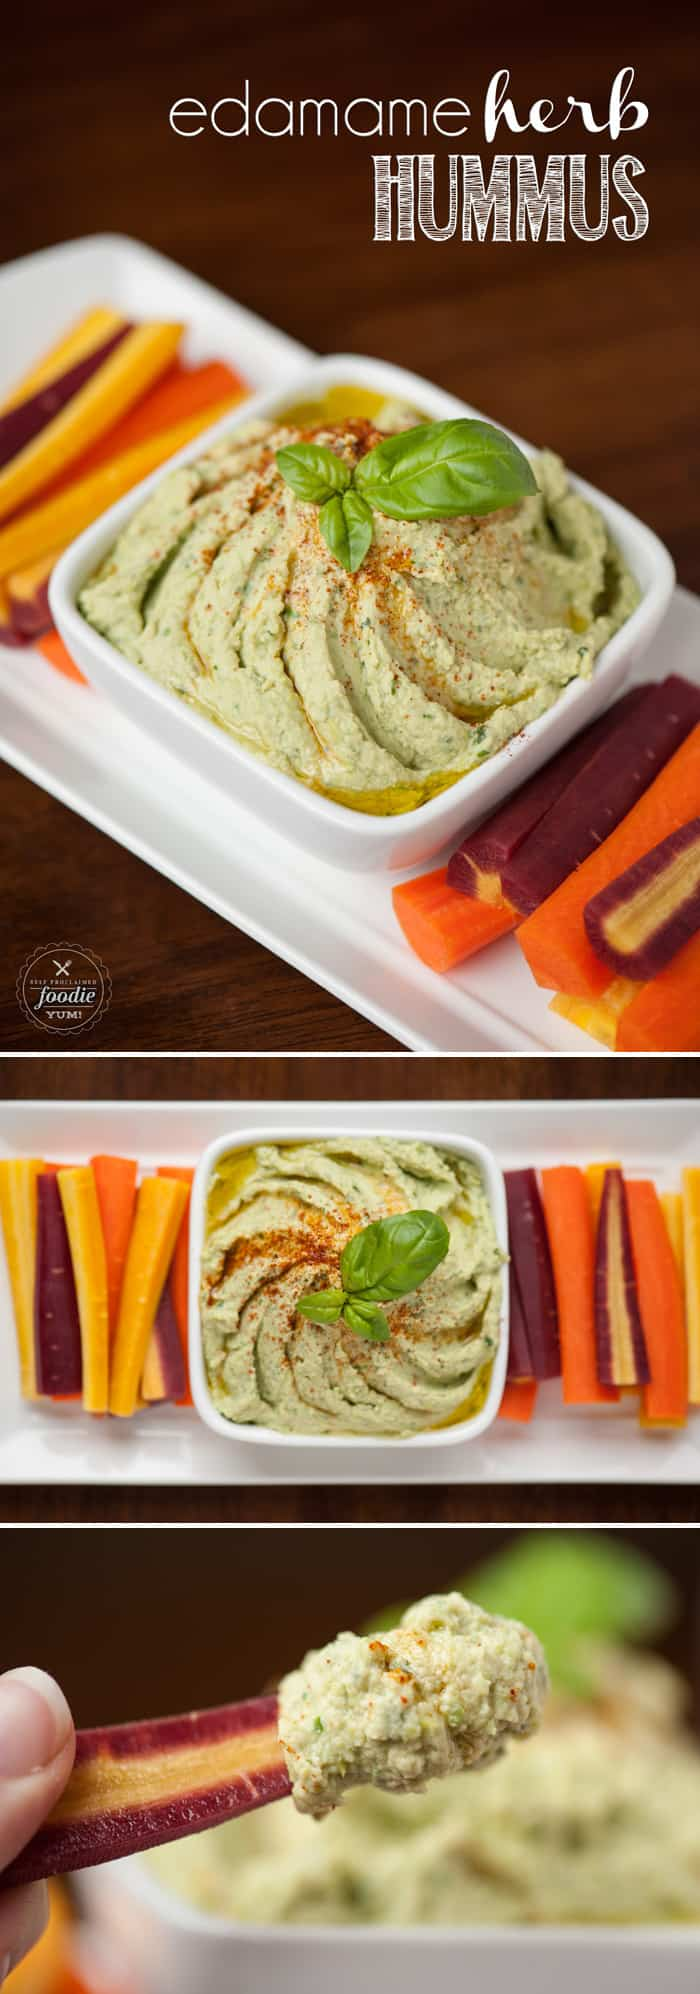 Edamame Herb Hummus | Self Proclaimed Foodie